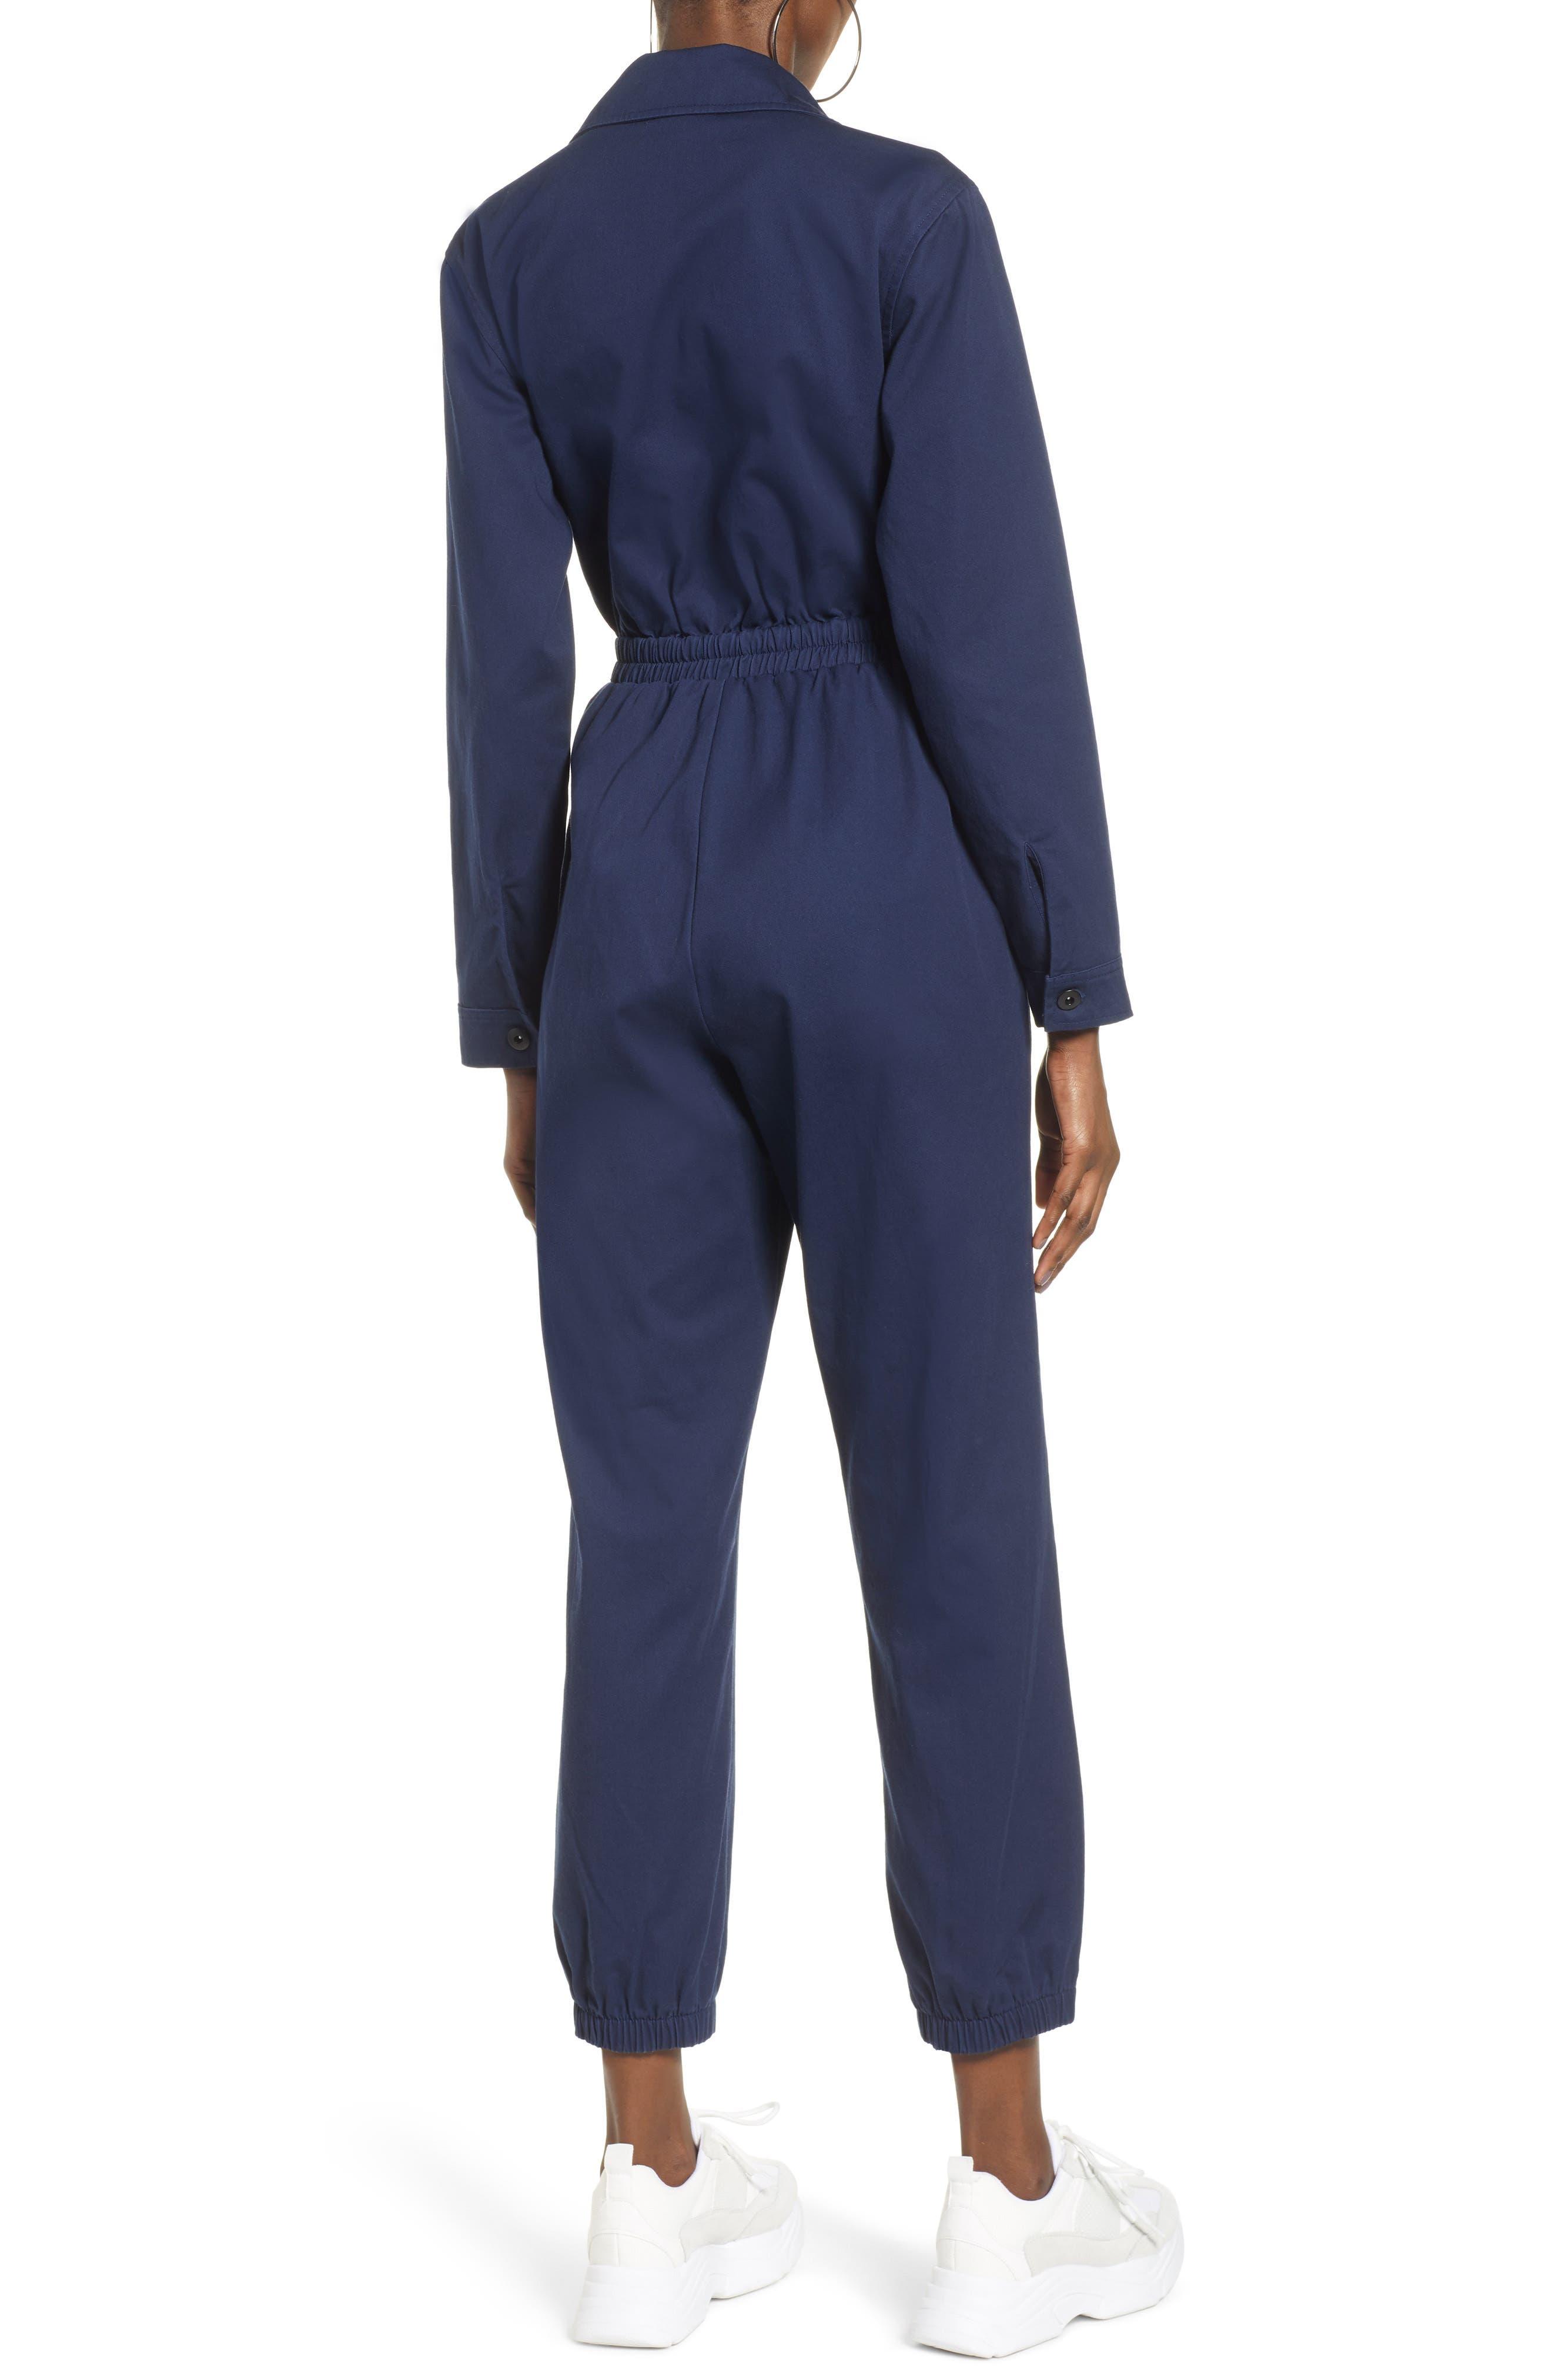 TEN SIXTY SHERMAN, Twill Workwear Jumpsuit, Alternate thumbnail 2, color, 400